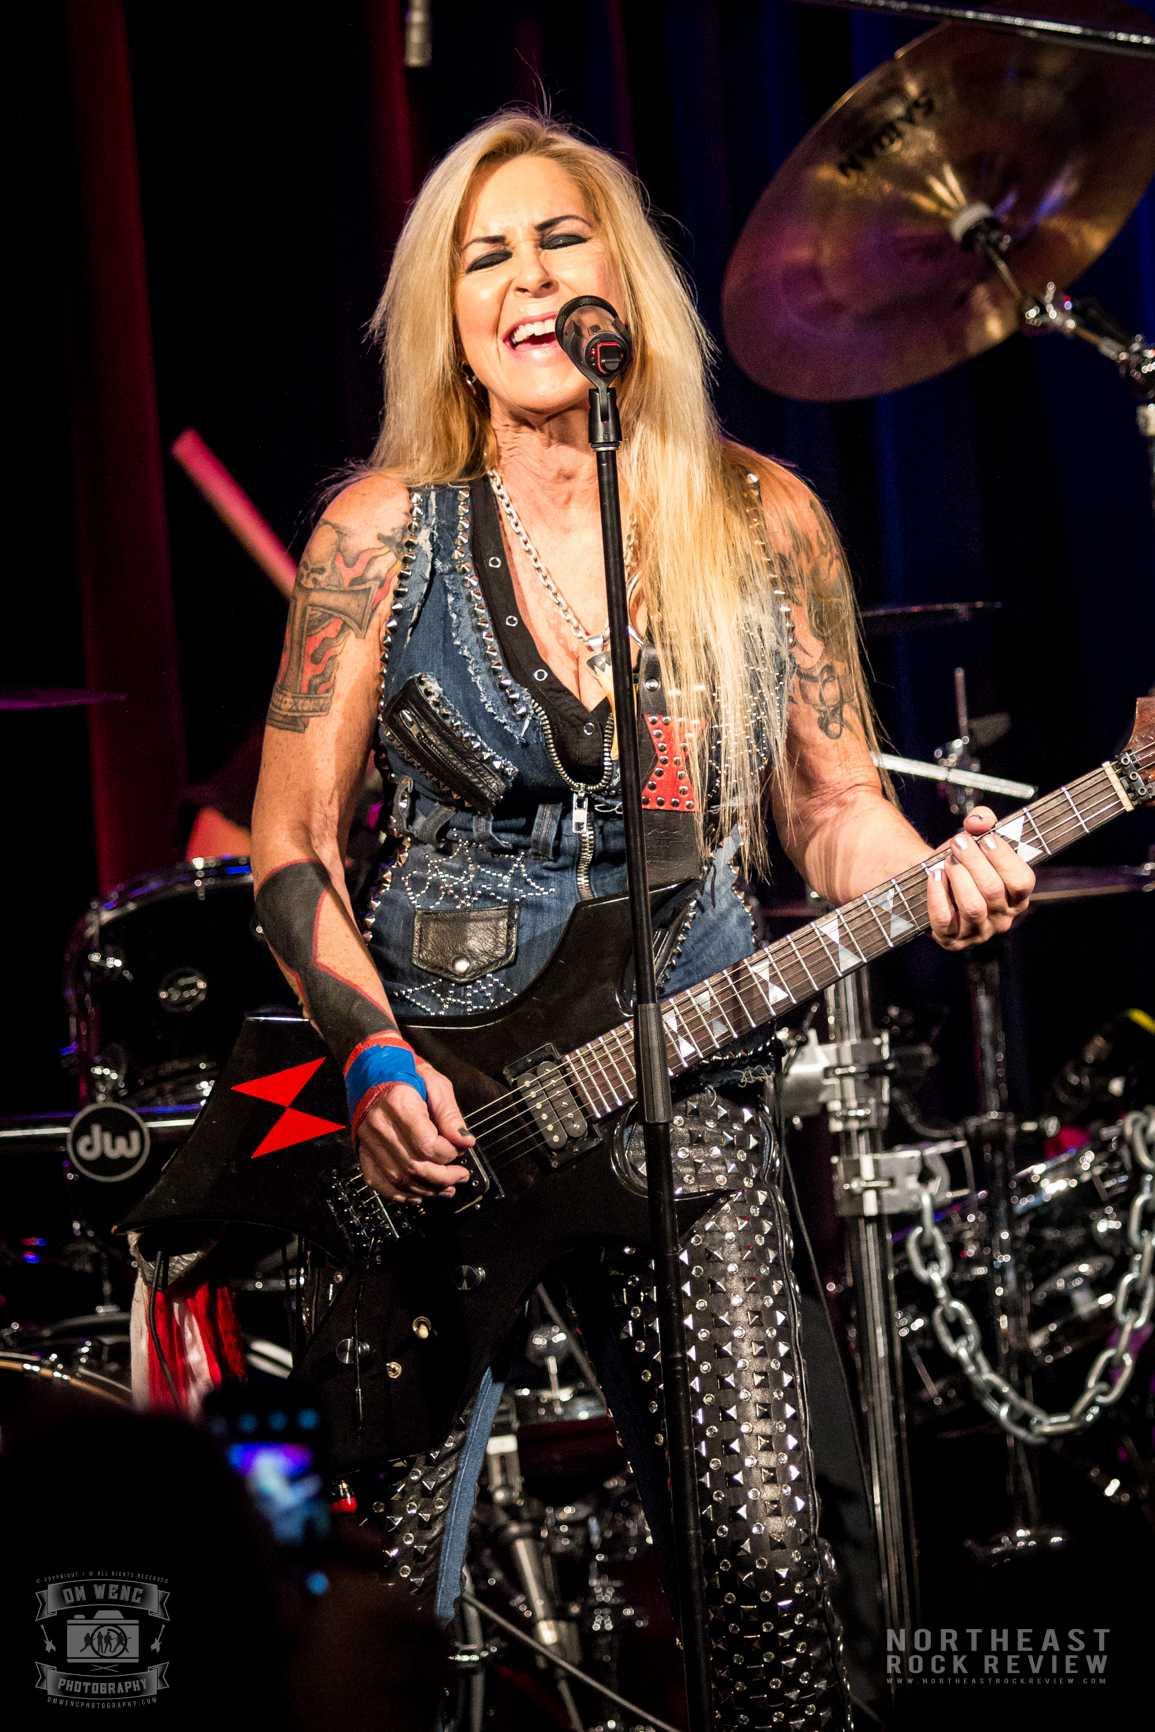 lita ford on the mic